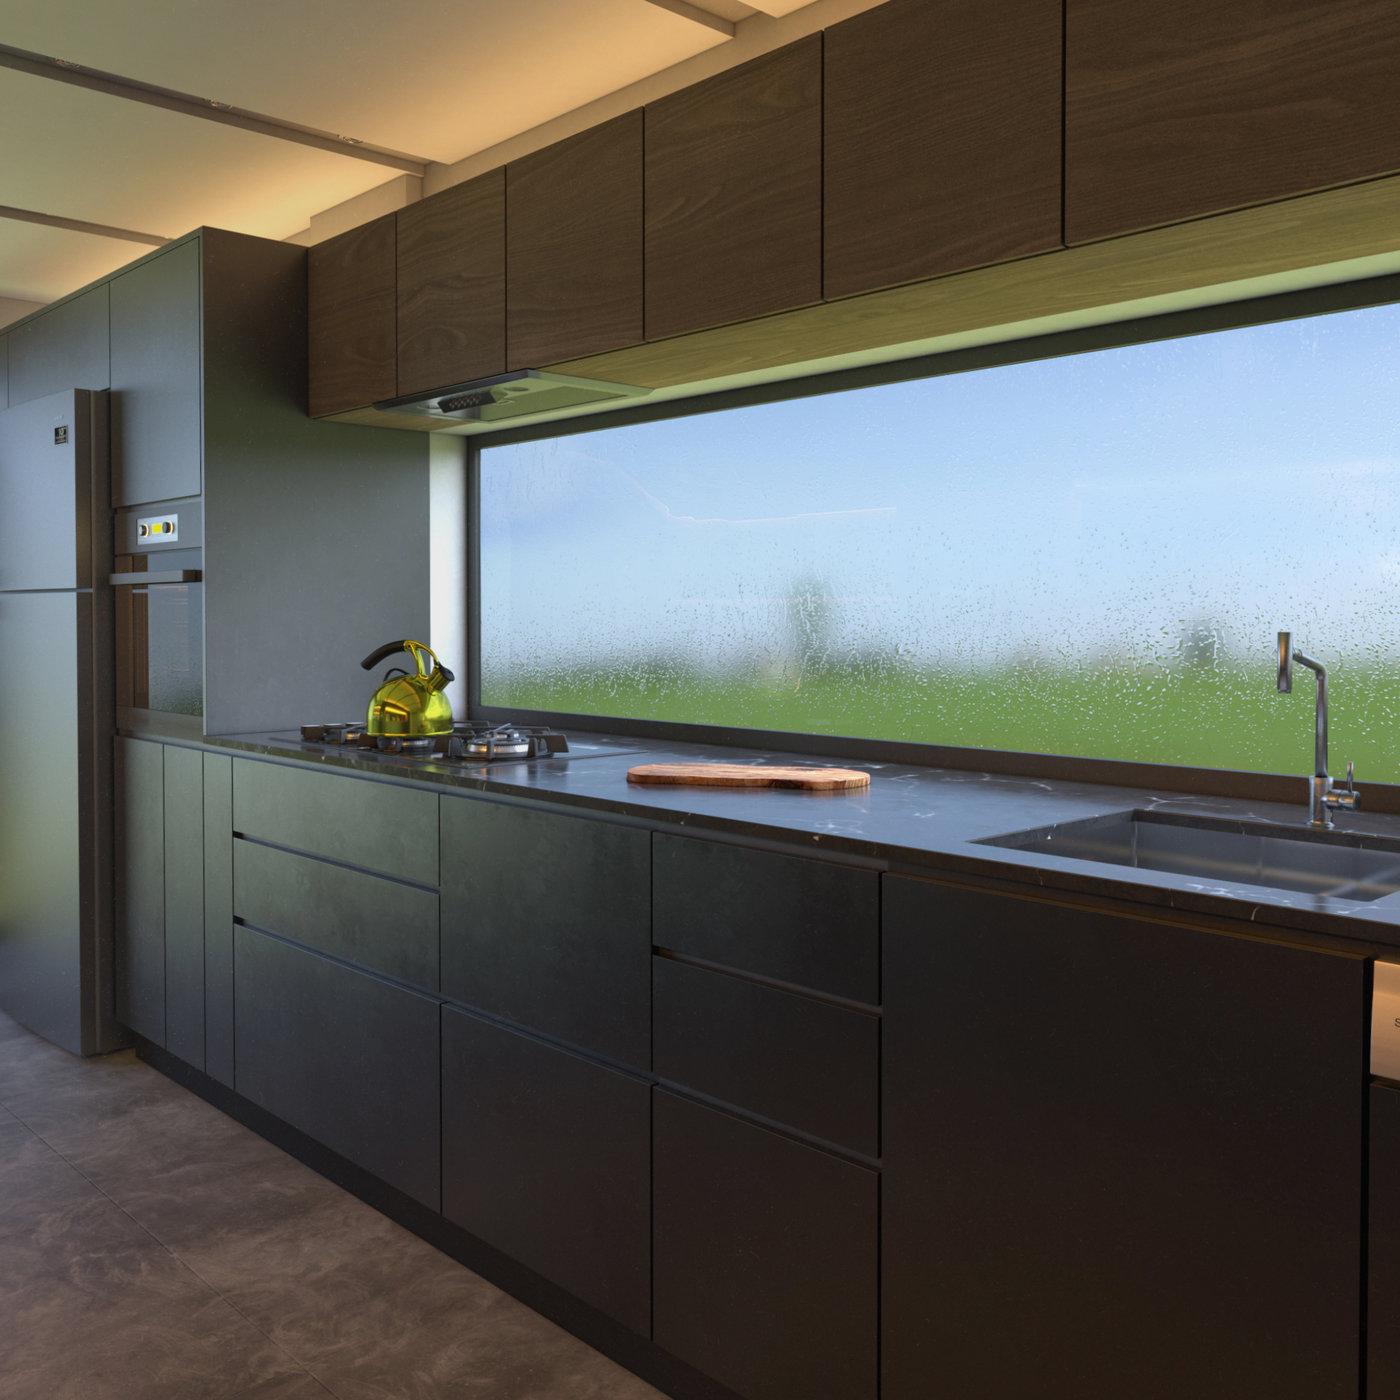 Kitchen designing, modeling and rendering